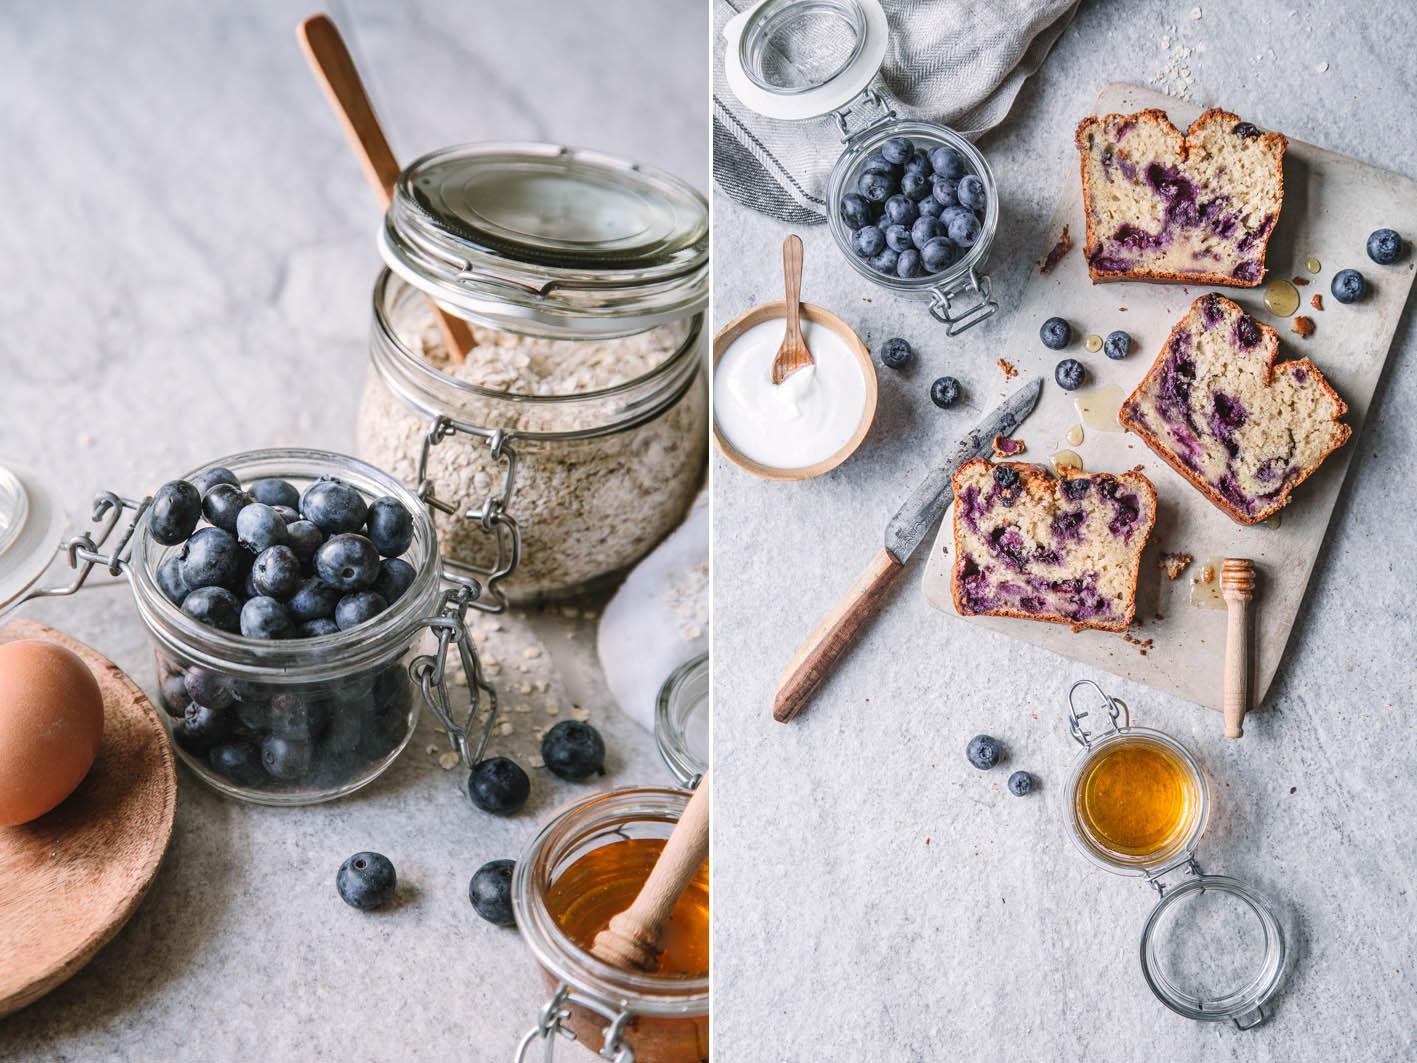 Saftiges Blueberry Bread mit Joghurt